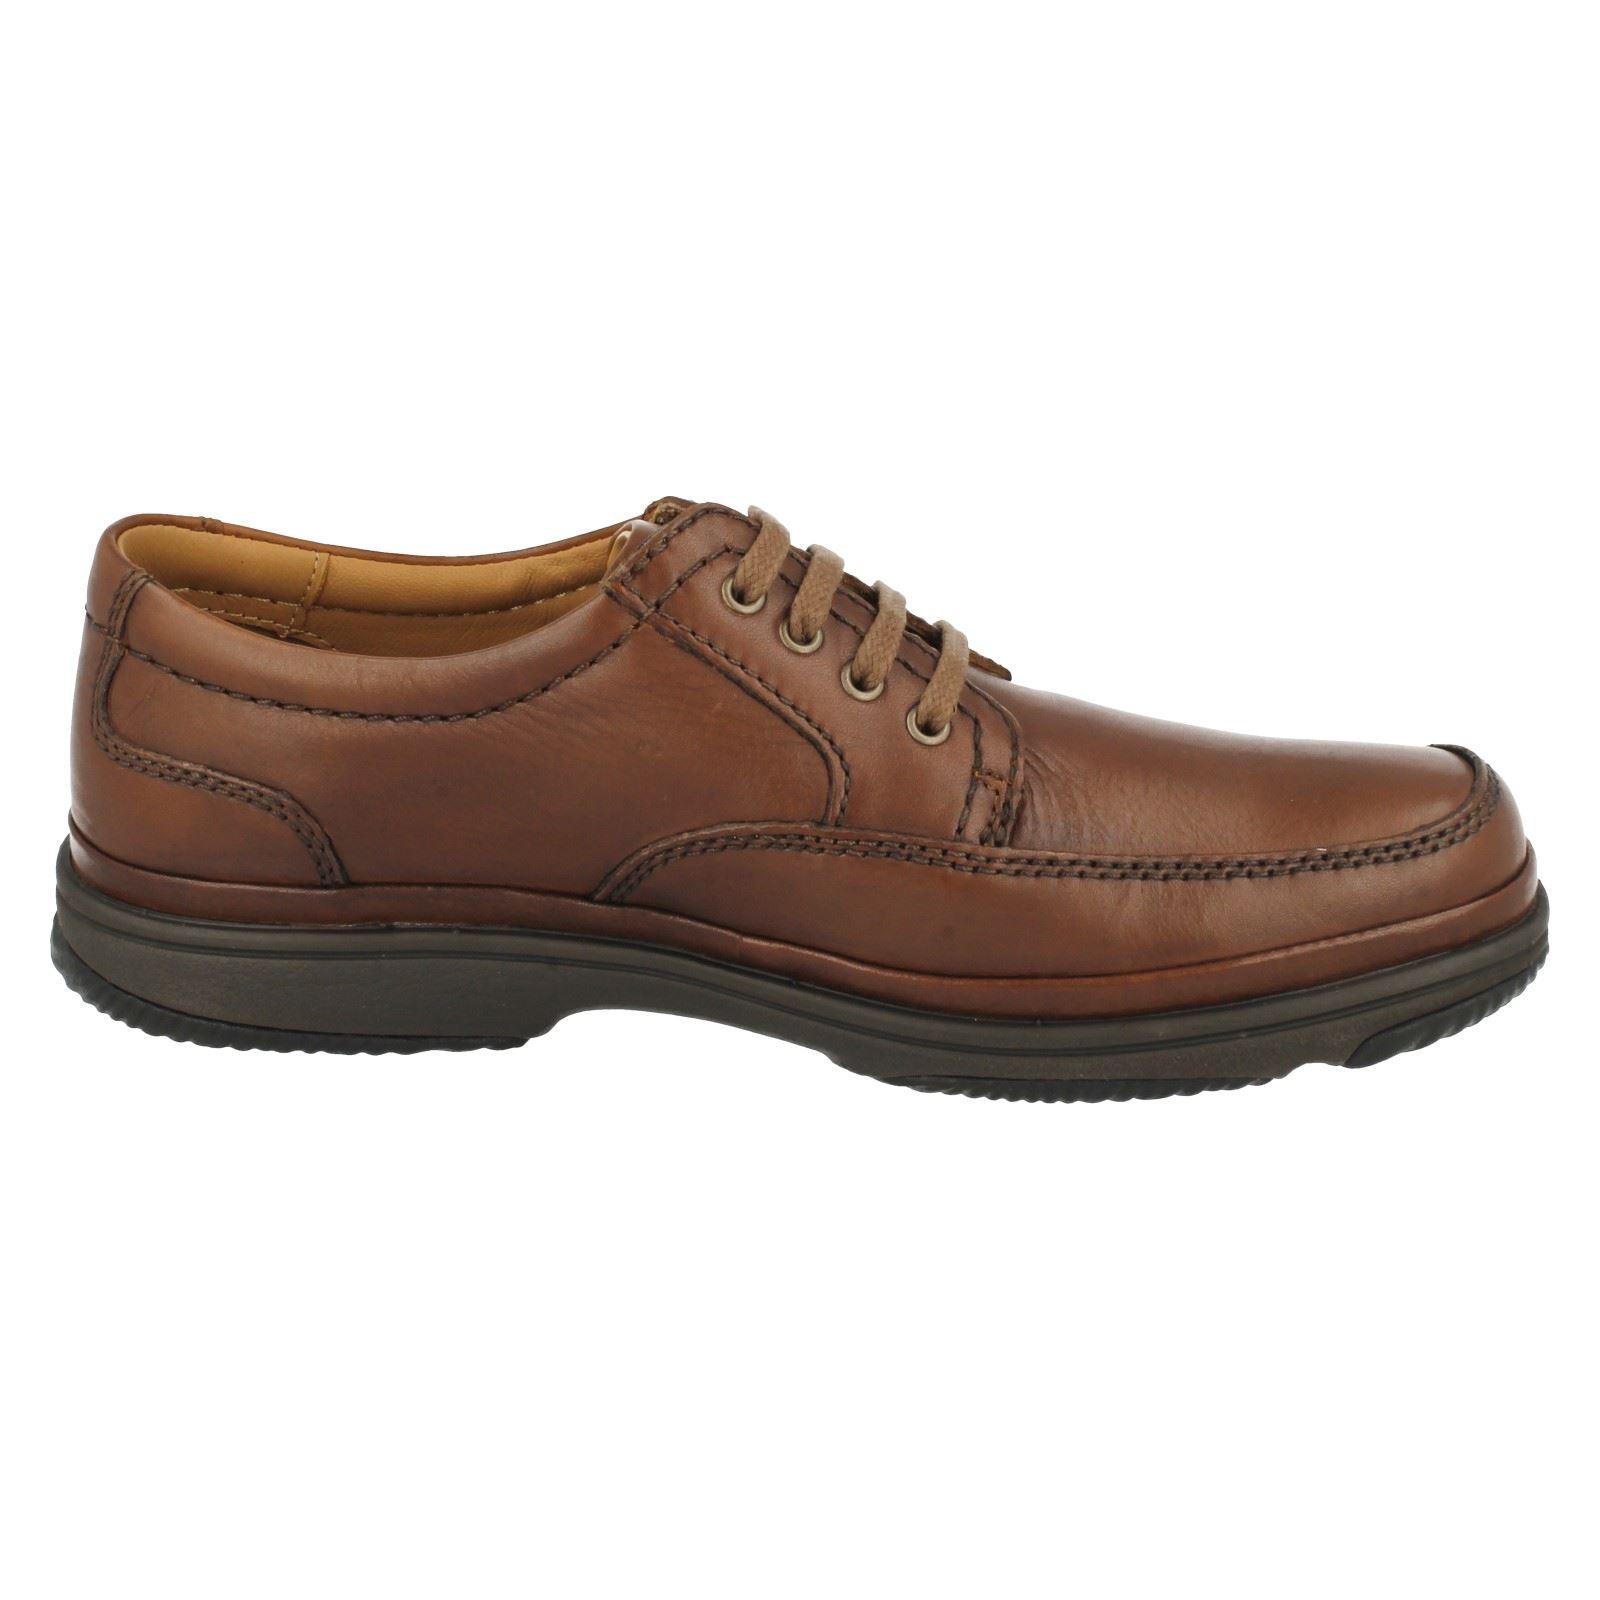 Clarks Flexlight Shoes